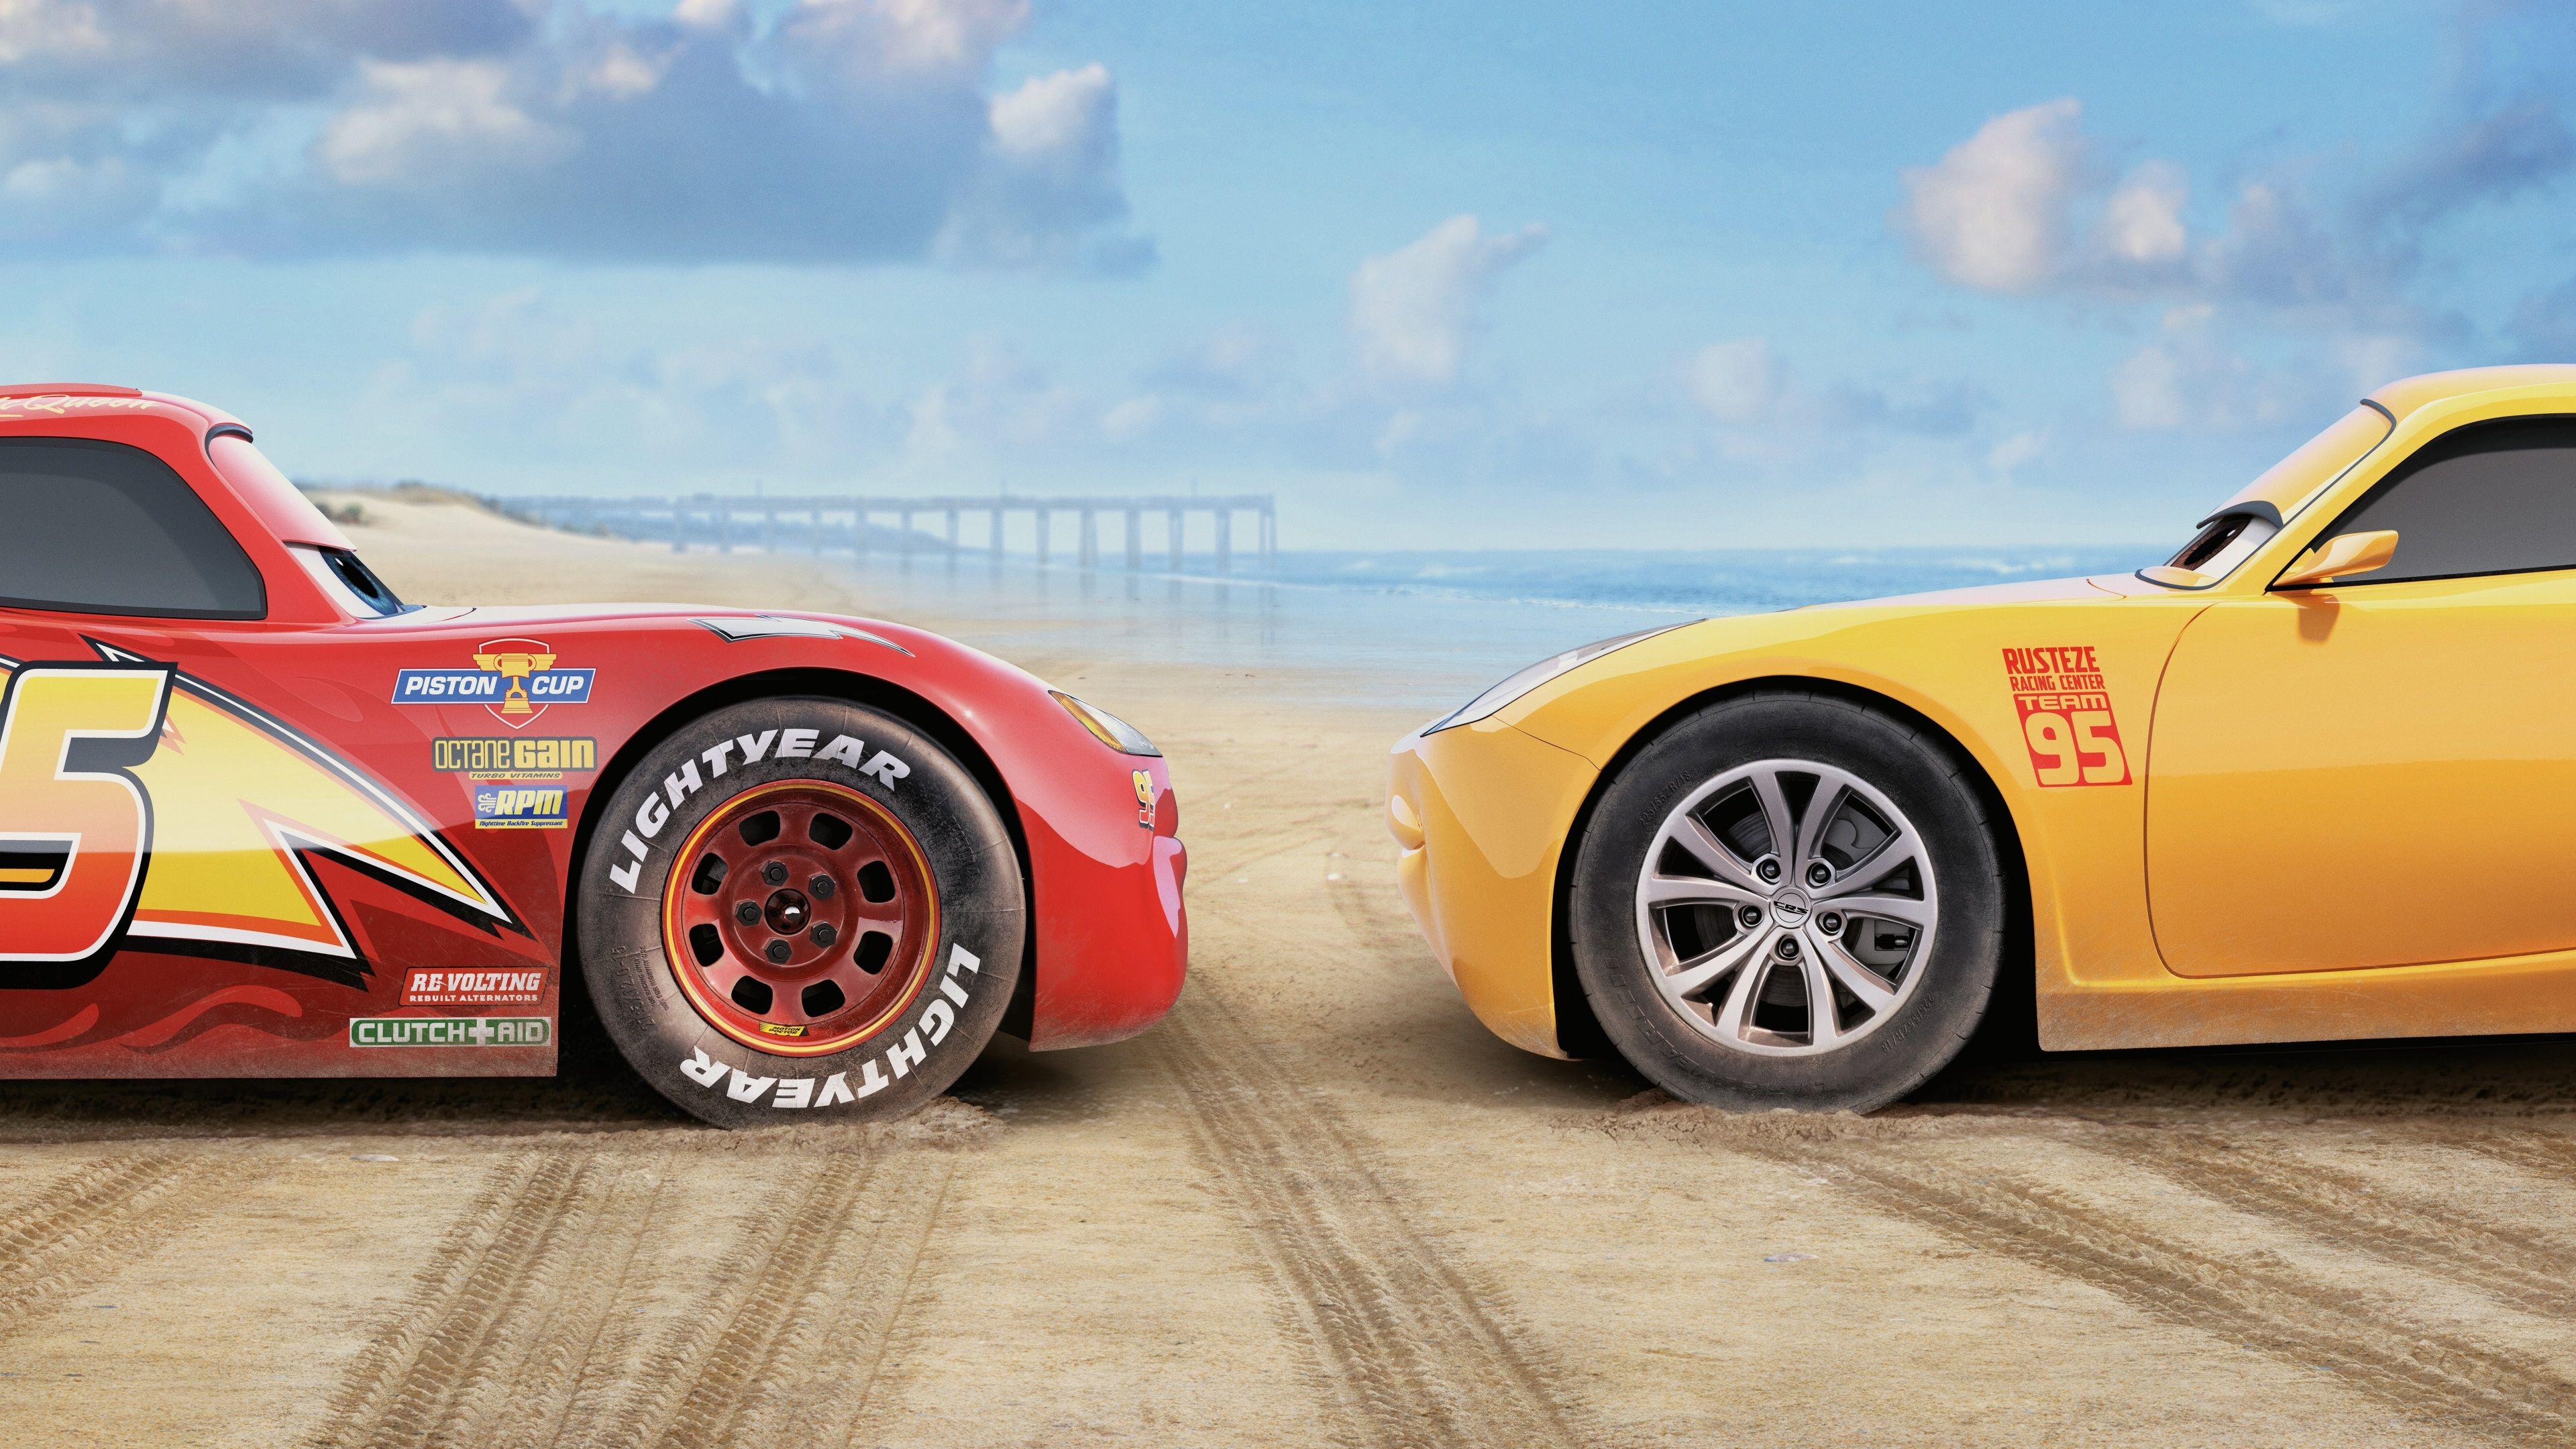 3840x2160 Cars 3 4k Mac Background Wallpaper Lightning Mcqueen